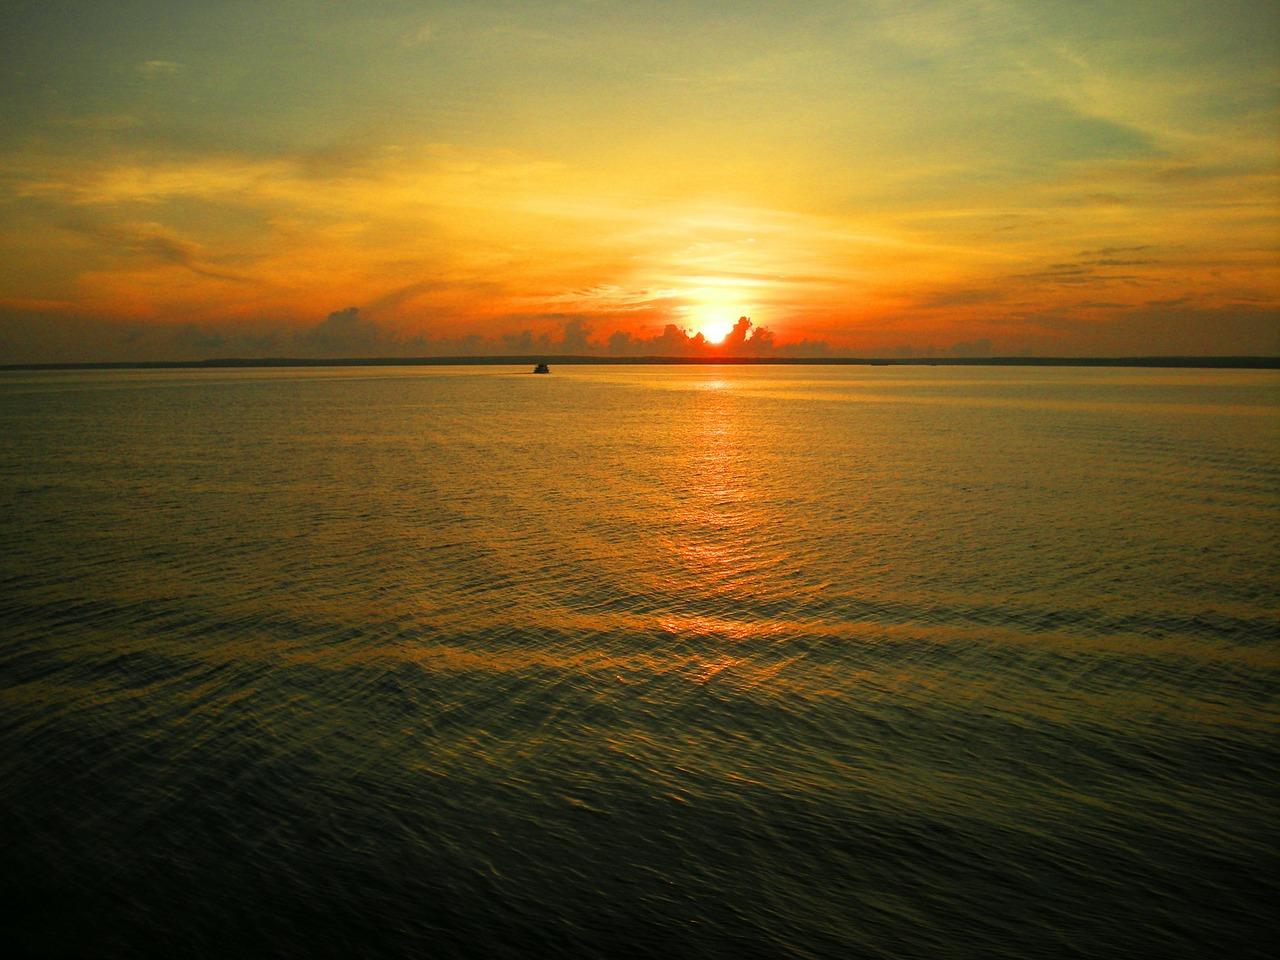 sunset-18085_1280